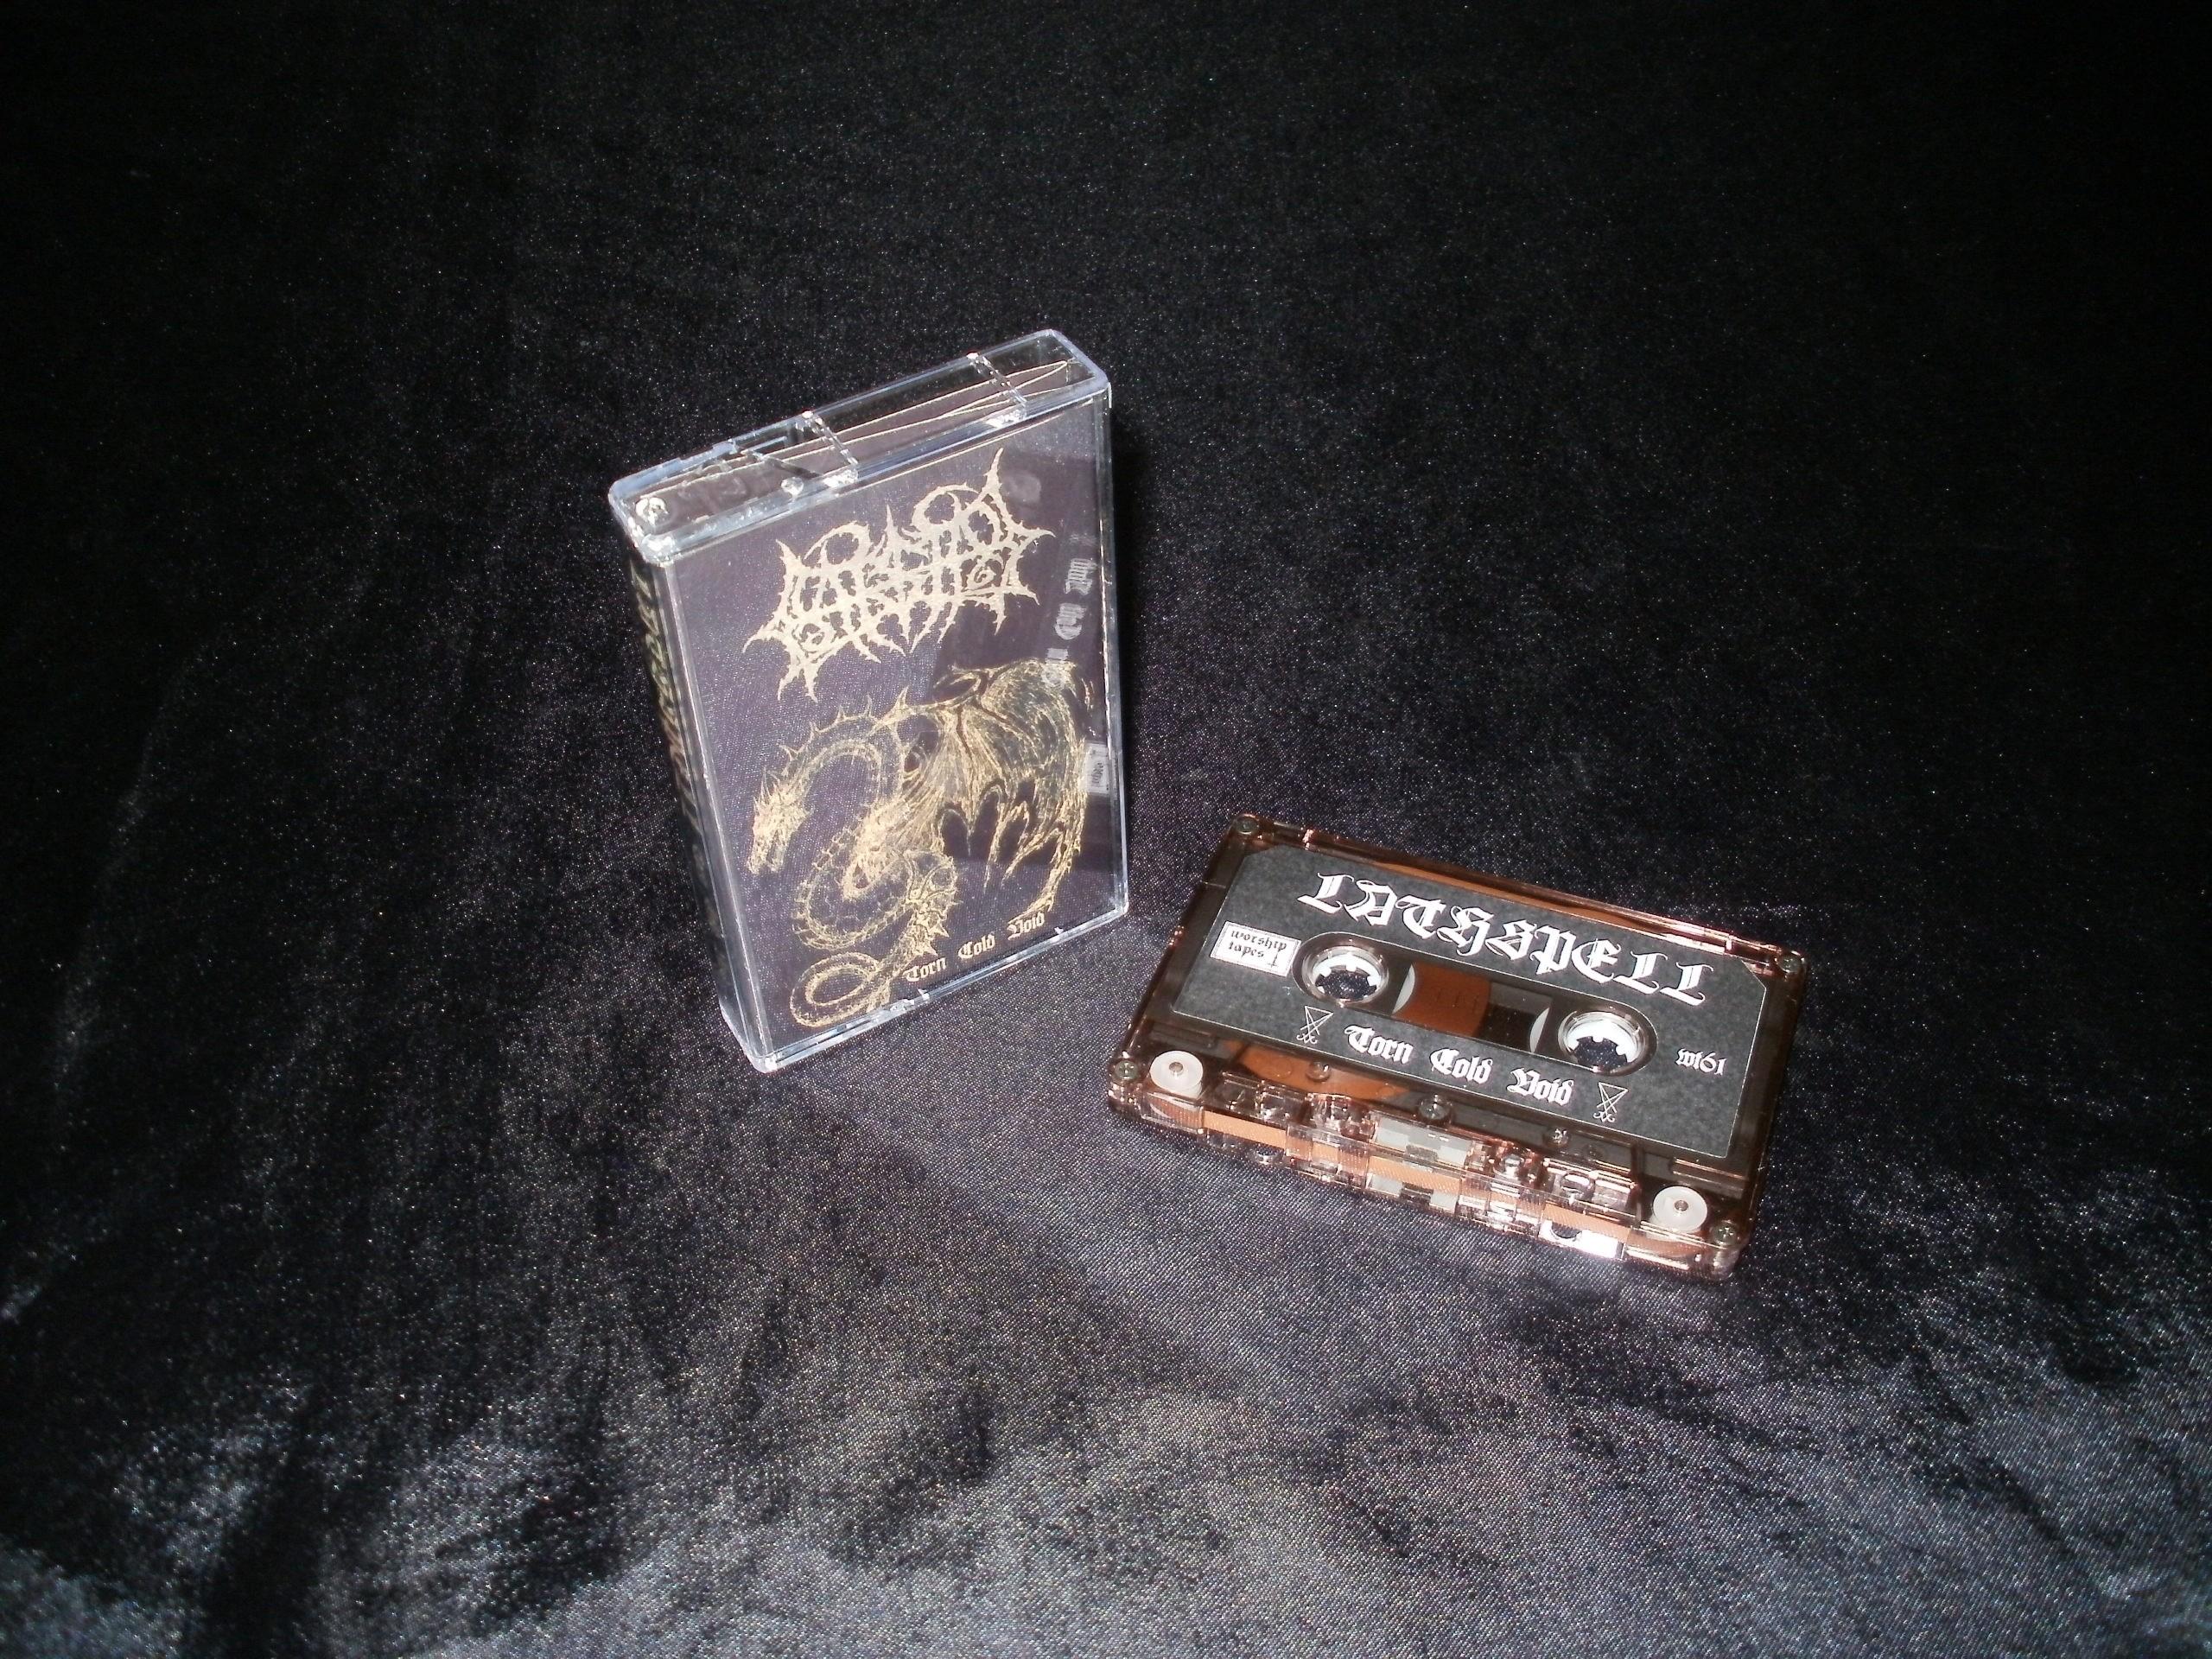 Lathspell Tape